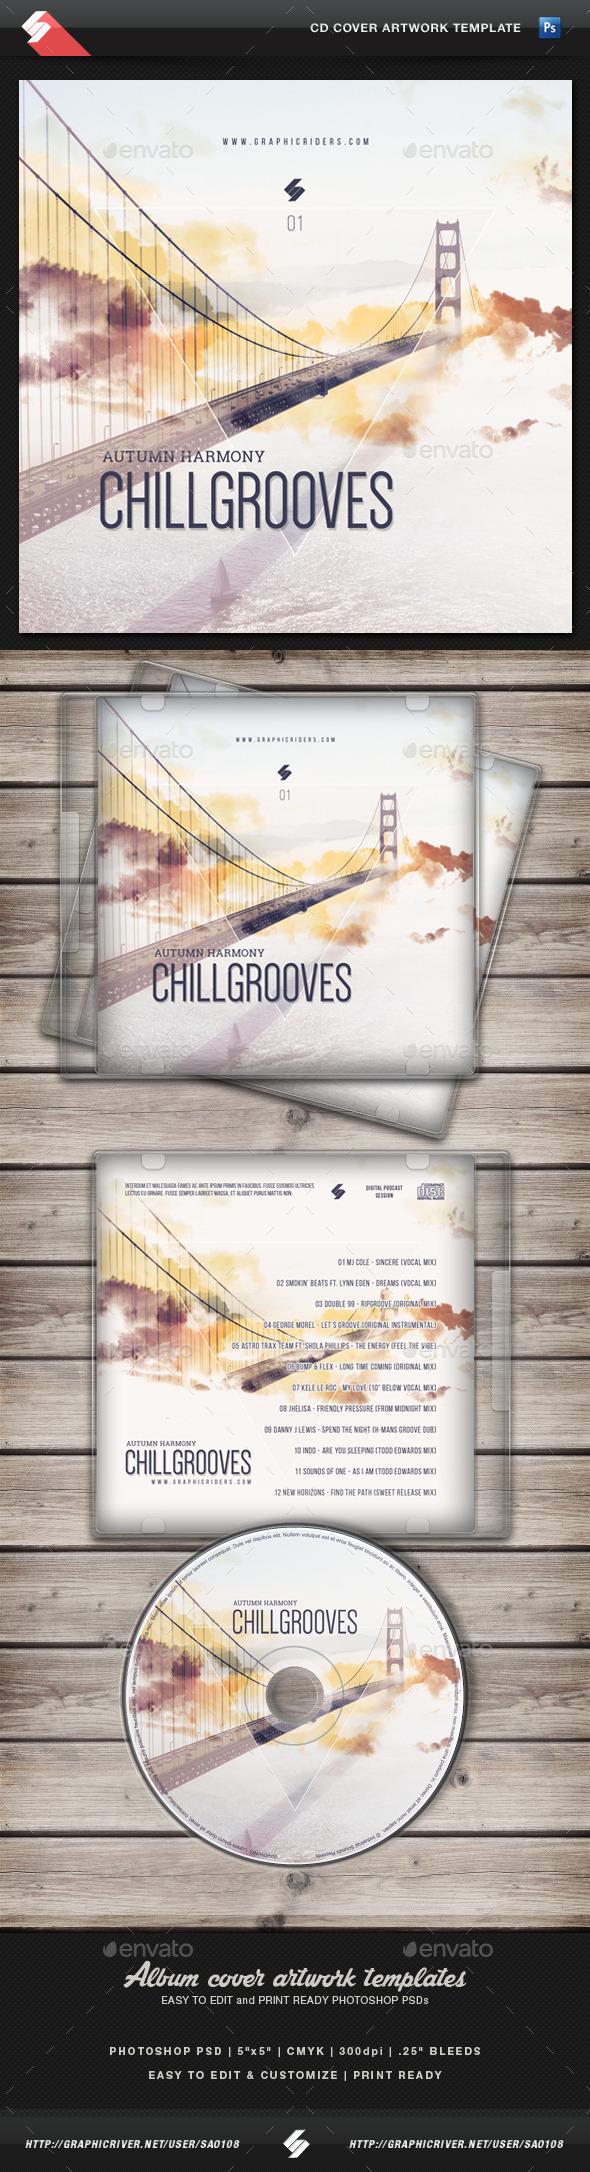 Chill Grooves (Autumn Harmony) - CD Cover Artwork - CD & DVD Artwork Print Templates